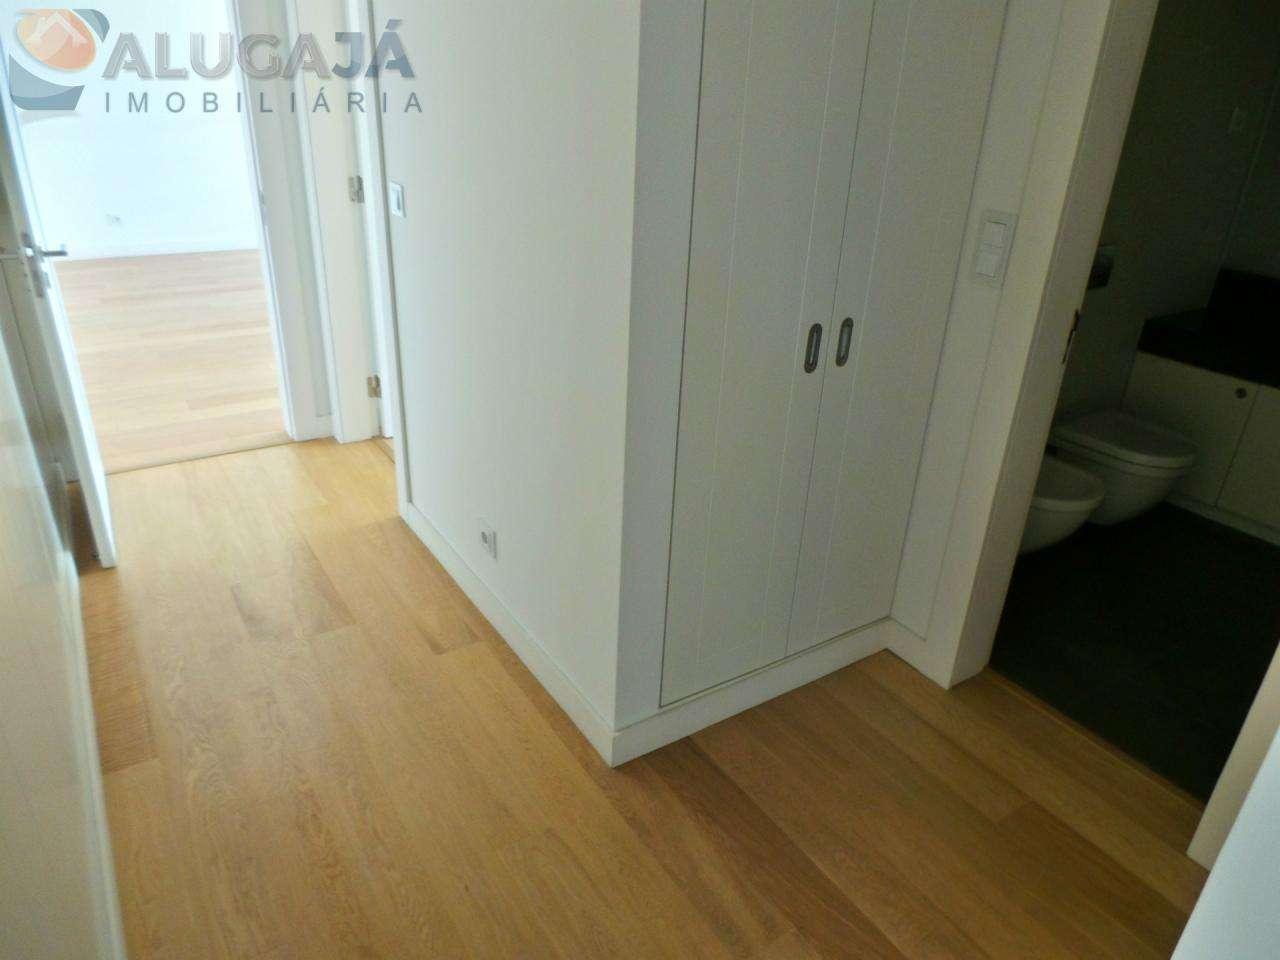 Apartamento para comprar, Belém, Lisboa - Foto 16